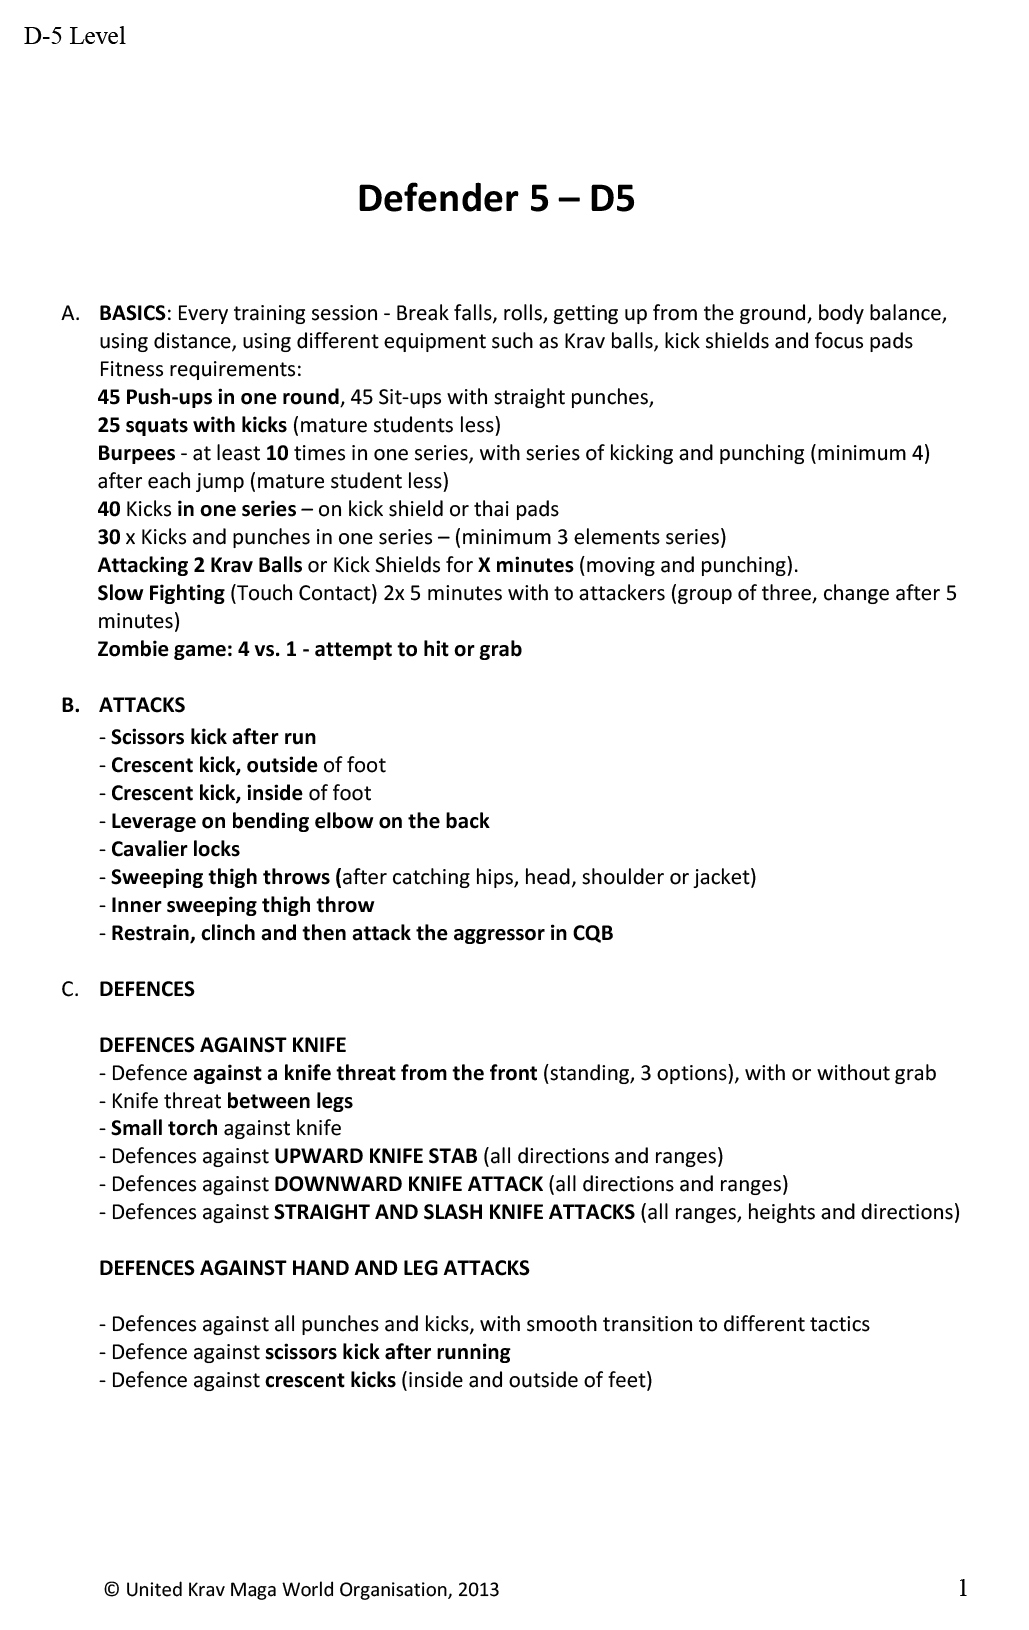 D5_ENGLISH.pdf-1.jpg